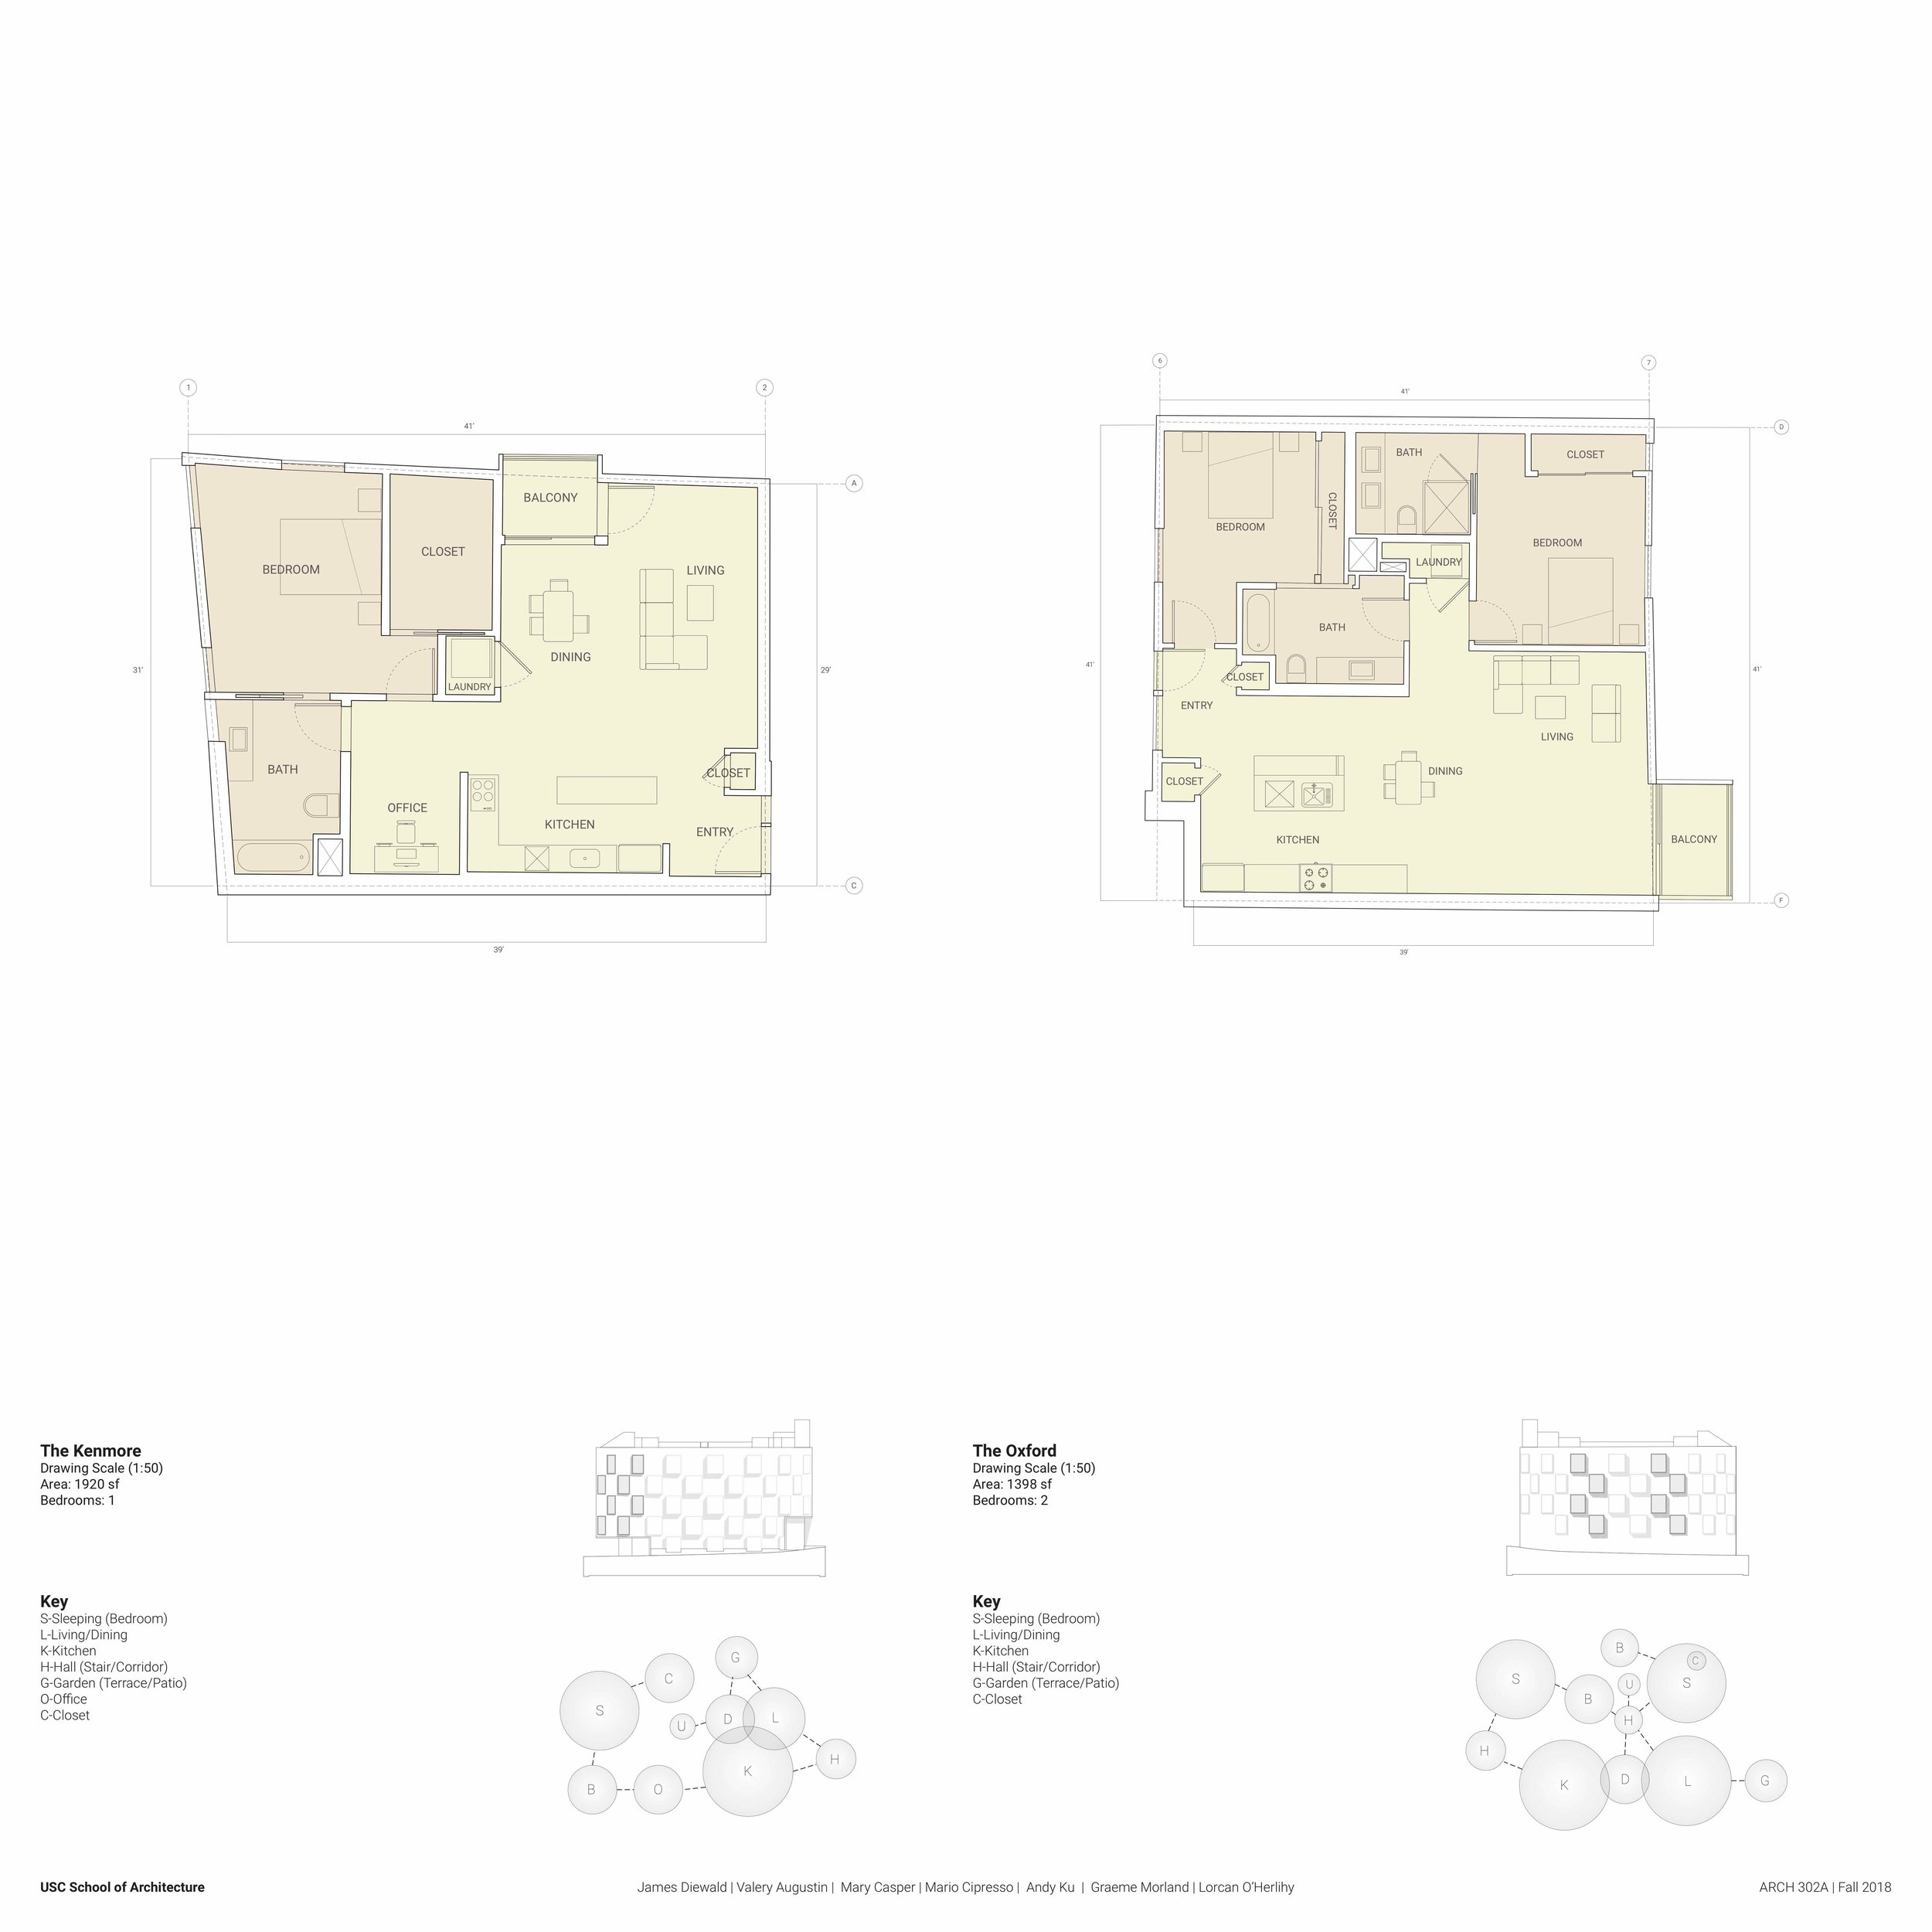 302A-Typology_Analysis_Mariposa 5.jpg